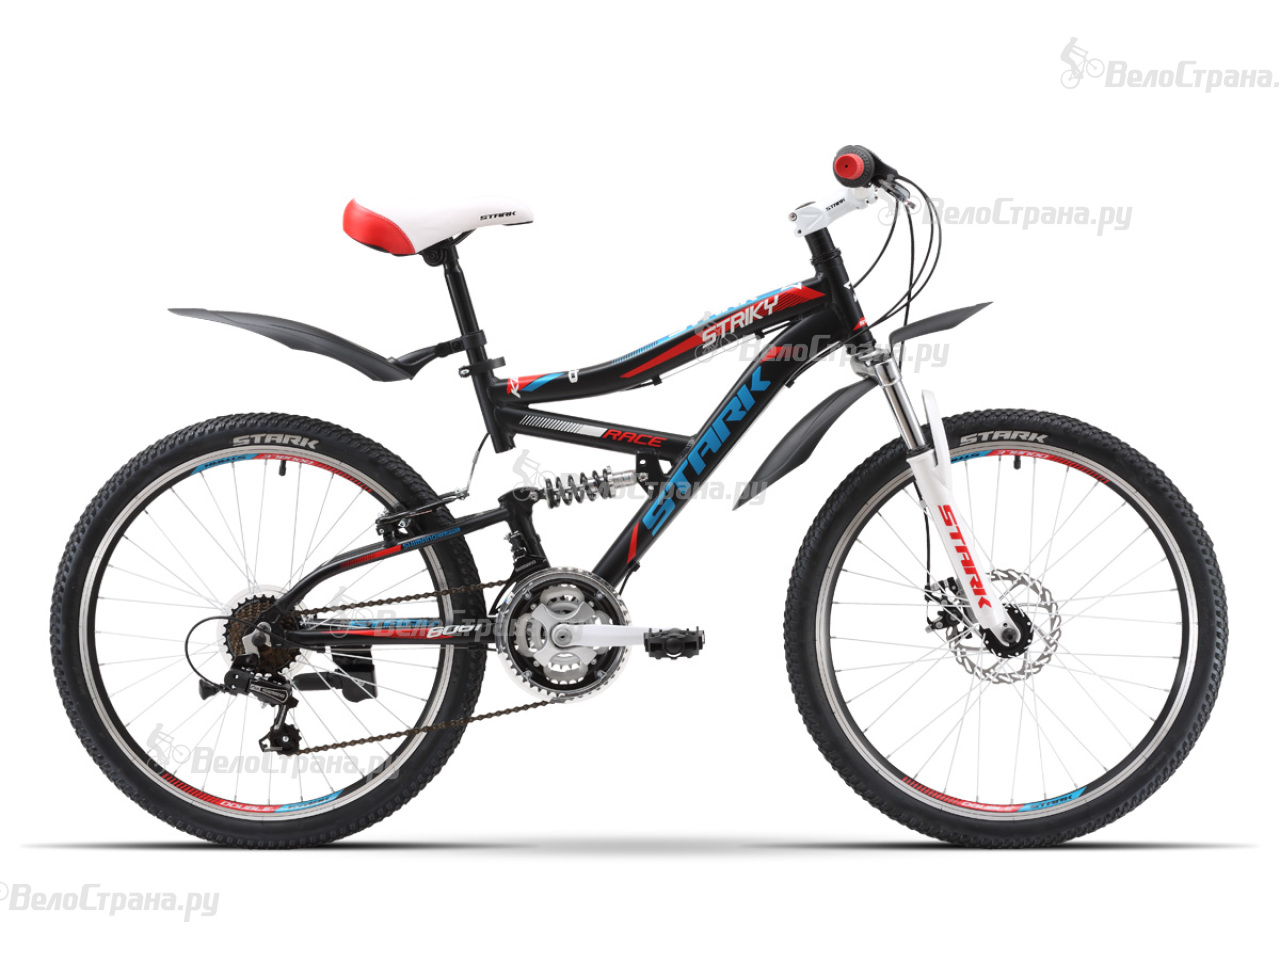 Велосипед Stark Striky FS Disc (2016) велосипед stark jumper 26 2 fs d 2017